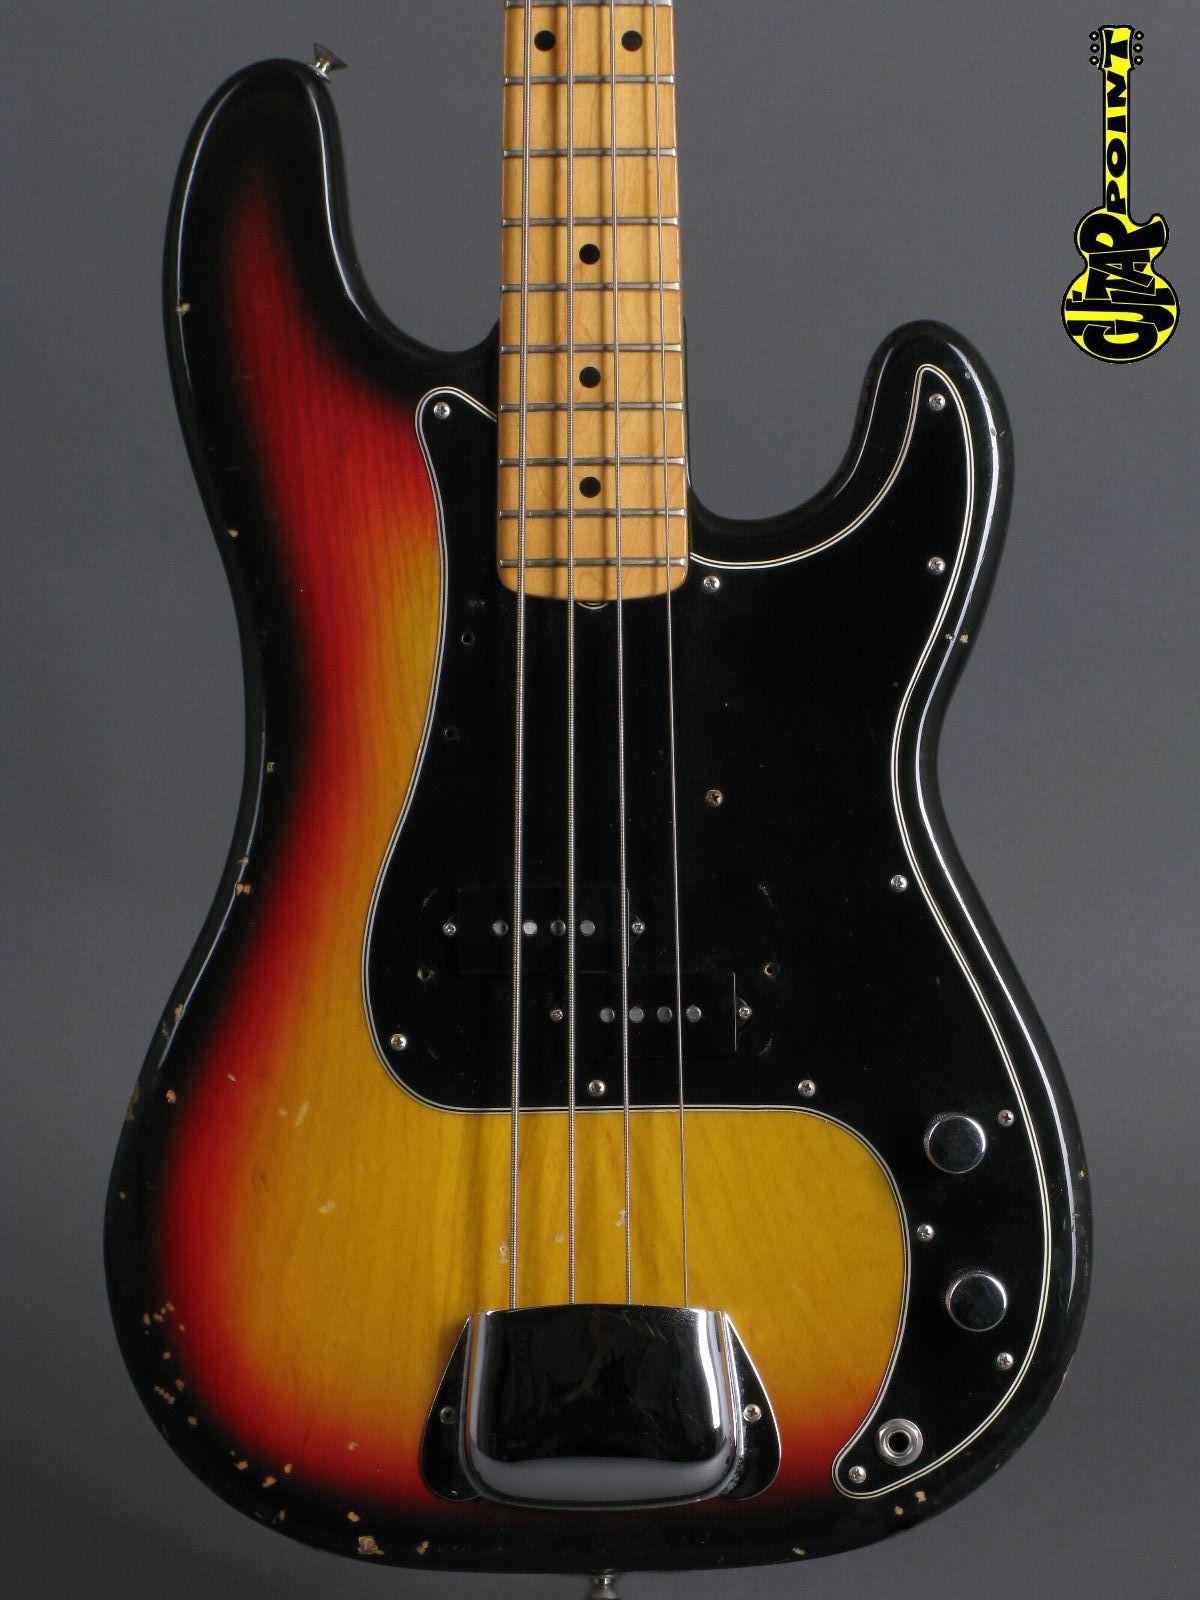 1977 Fender Precision Bass - 3-tone Sunburst